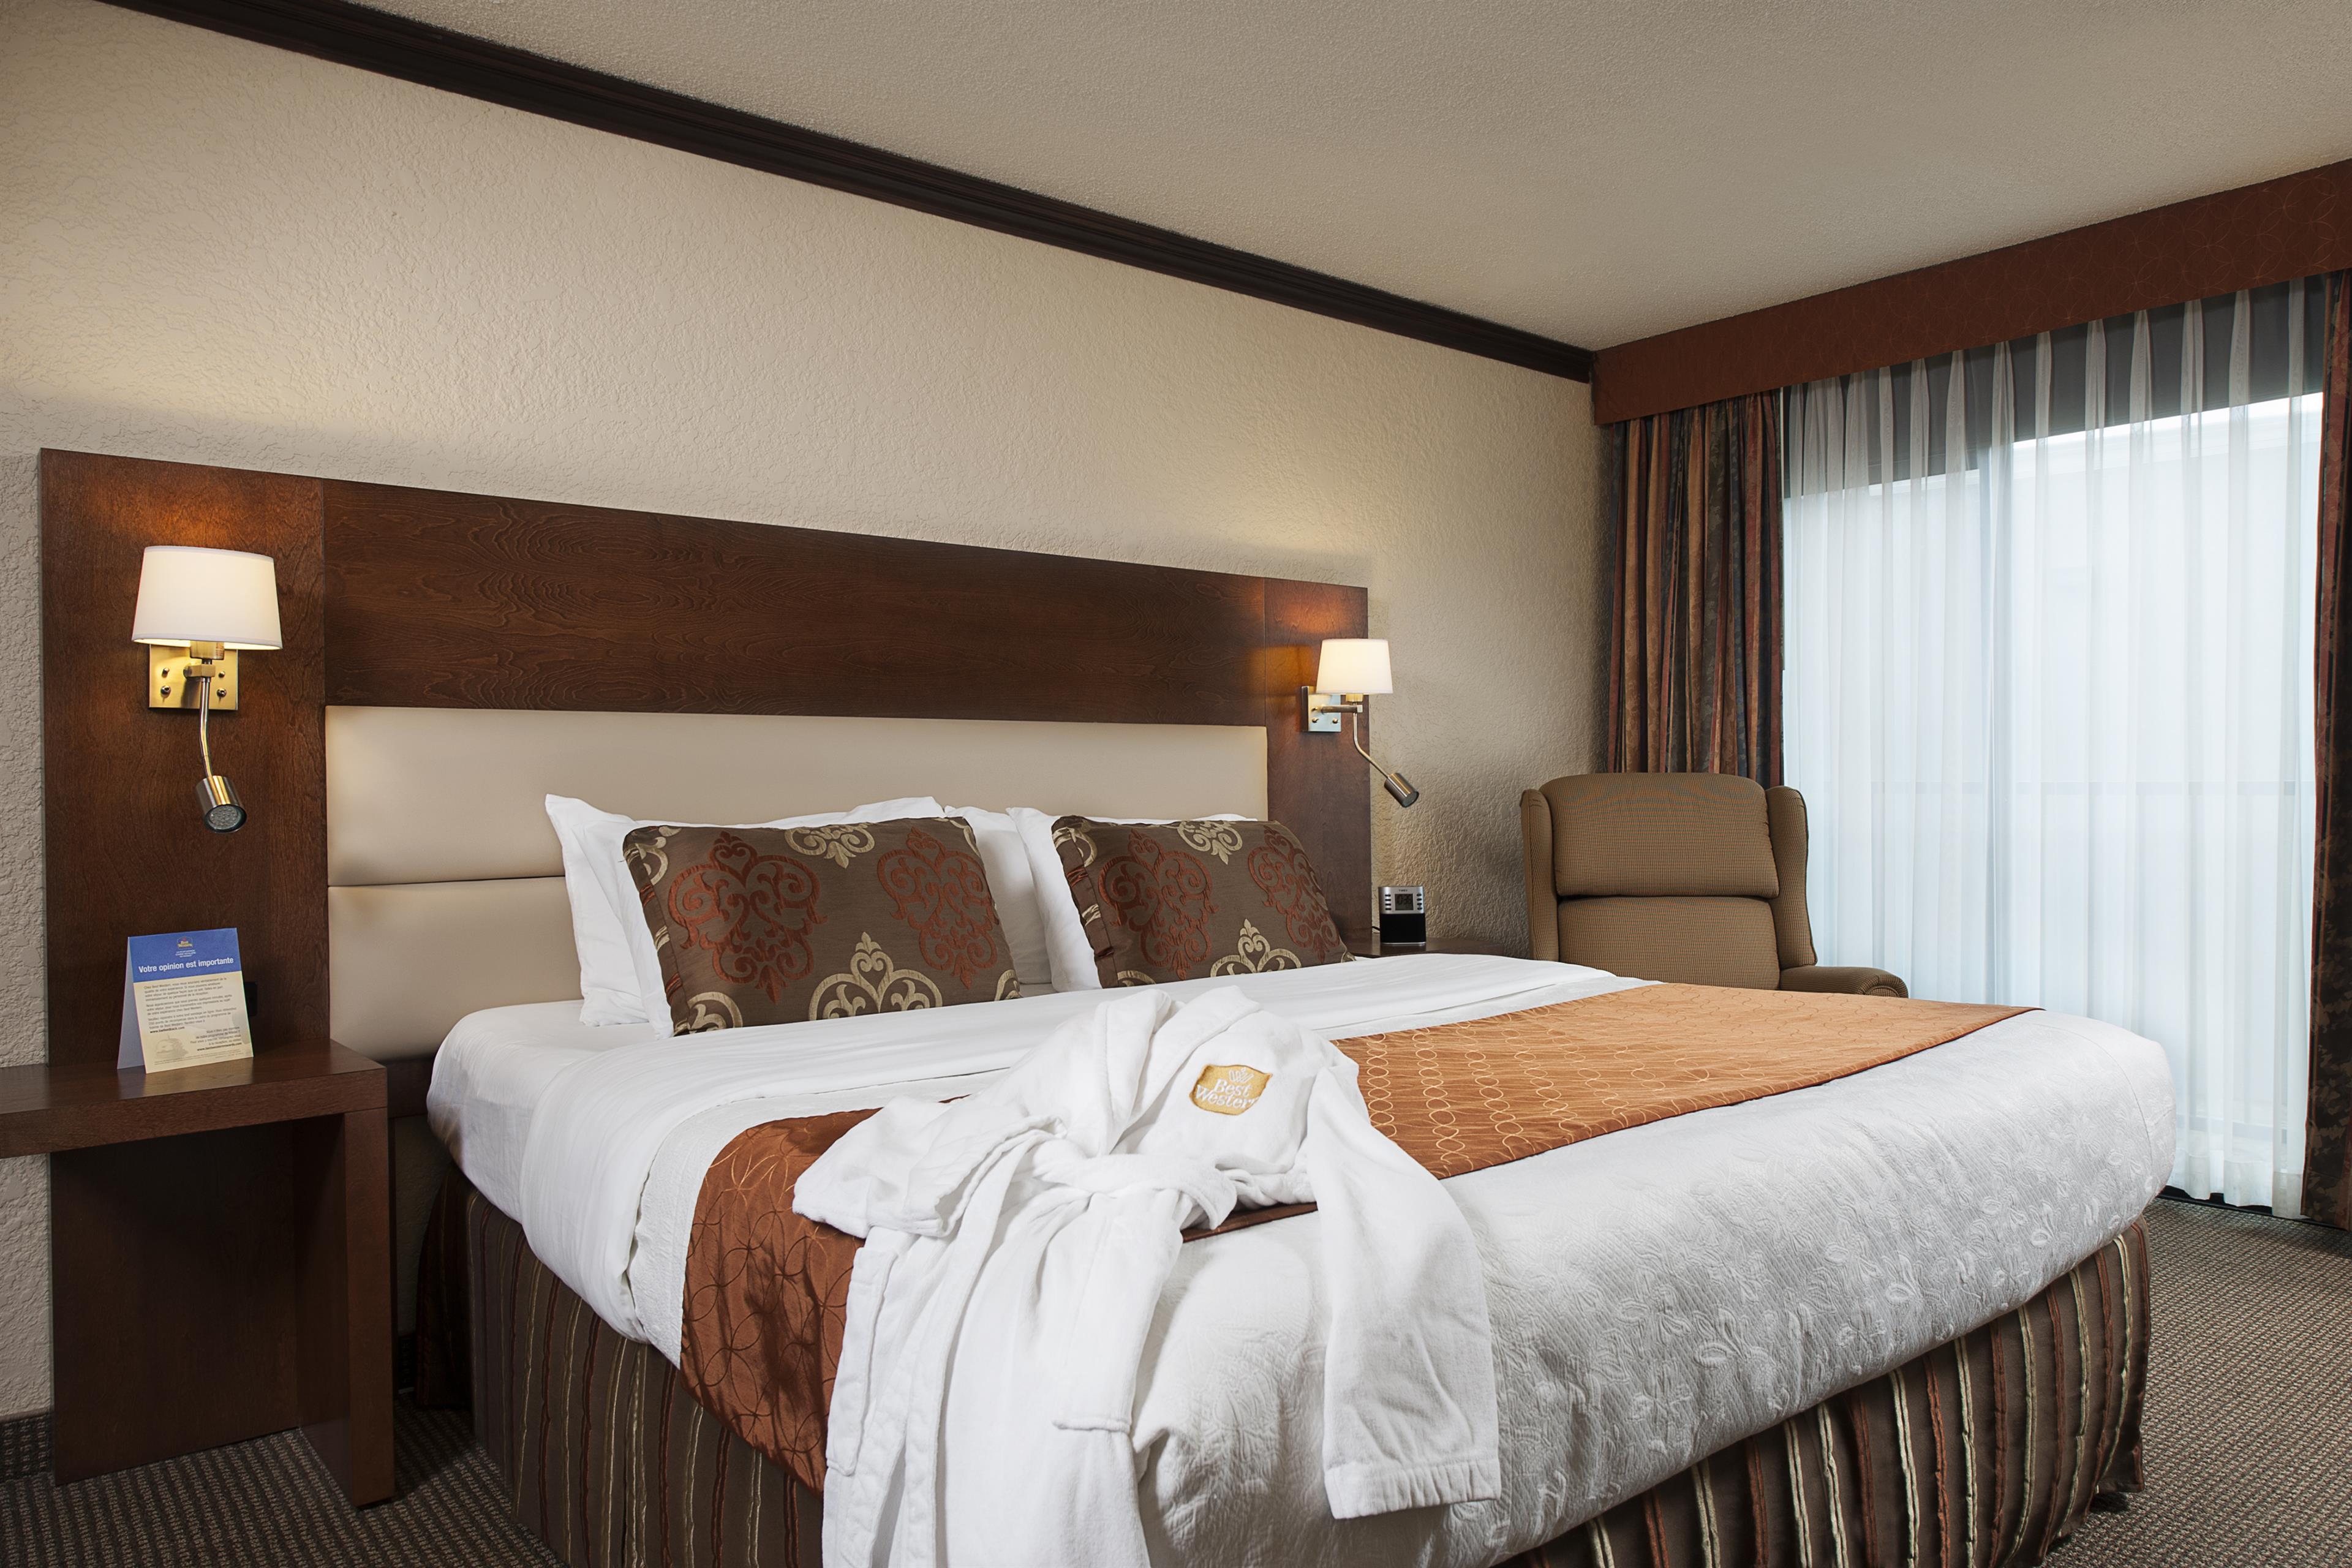 Best Western Hotel Universel Drummondville à Drummondville: Suite Queen